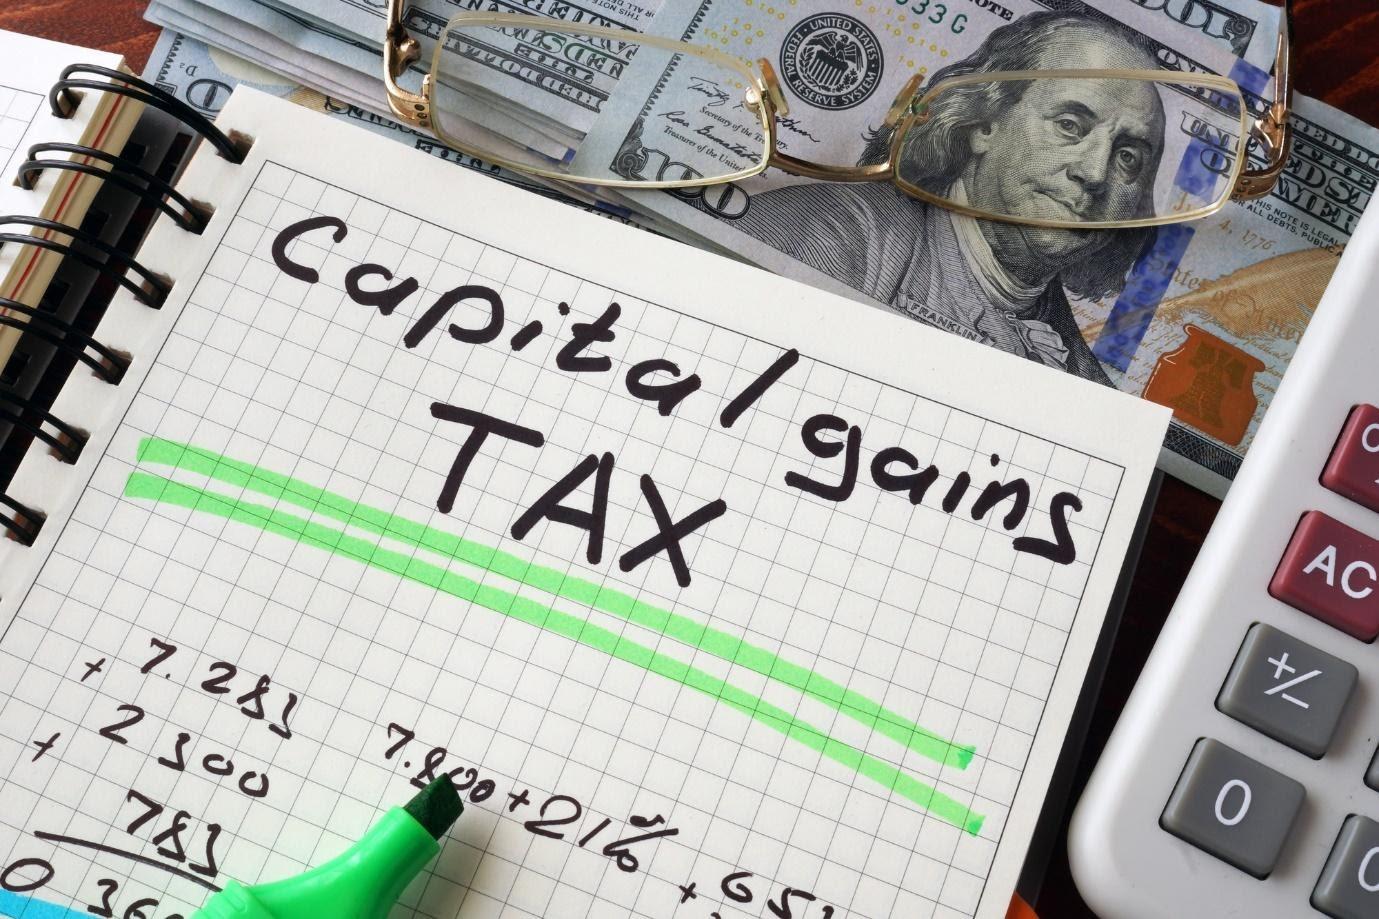 Top Facts U.S. Citizens About Biden's Capital Gains Tax Plan